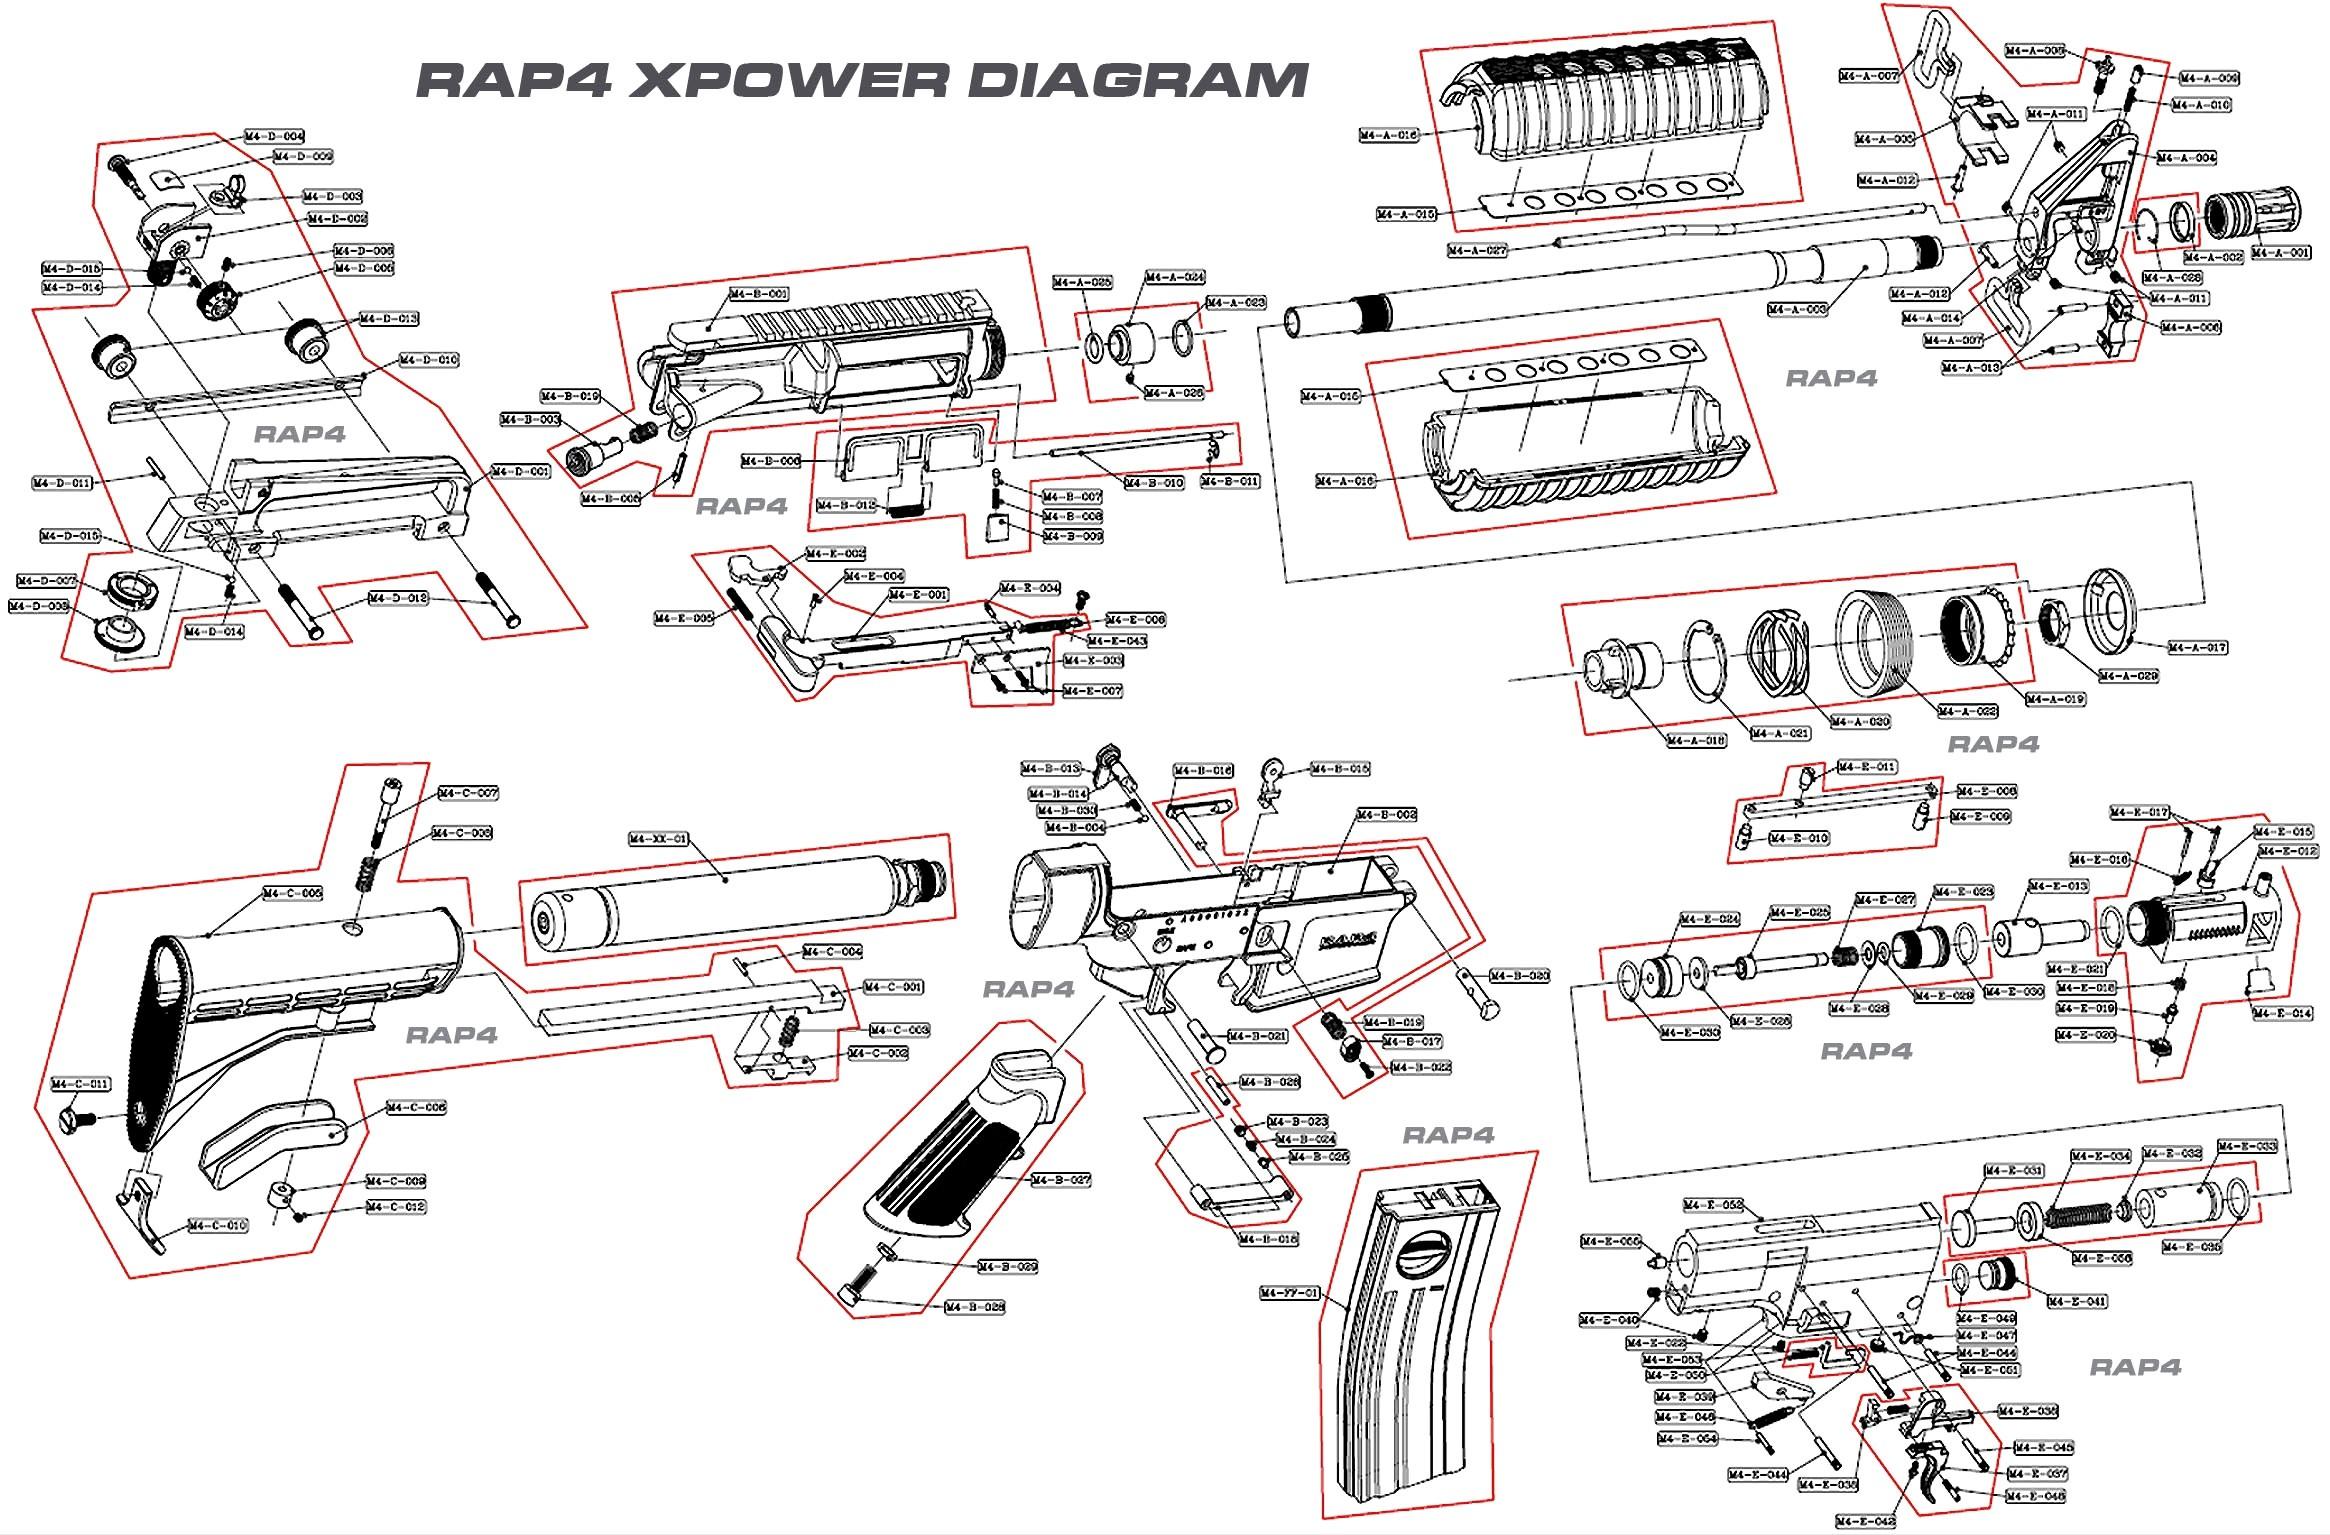 Find Comprehensive Diagram Of Car Parts Hyundai Body Parts Diagram Of Find Comprehensive Diagram Of Car Parts